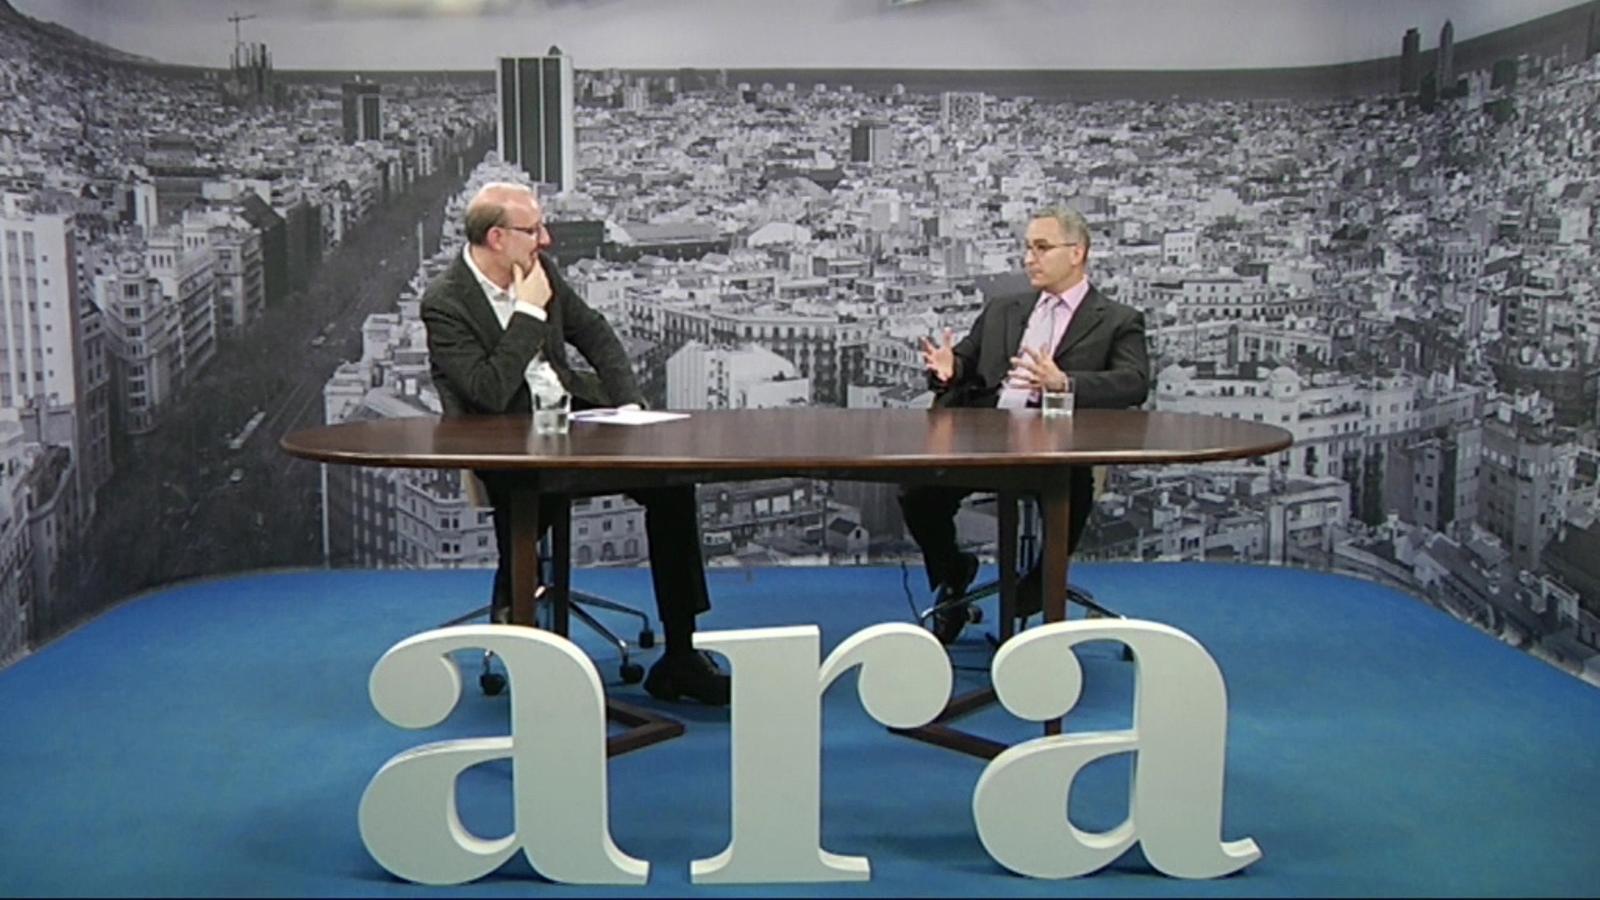 Entrevista d'Antoni Bassas a Pol Antràs